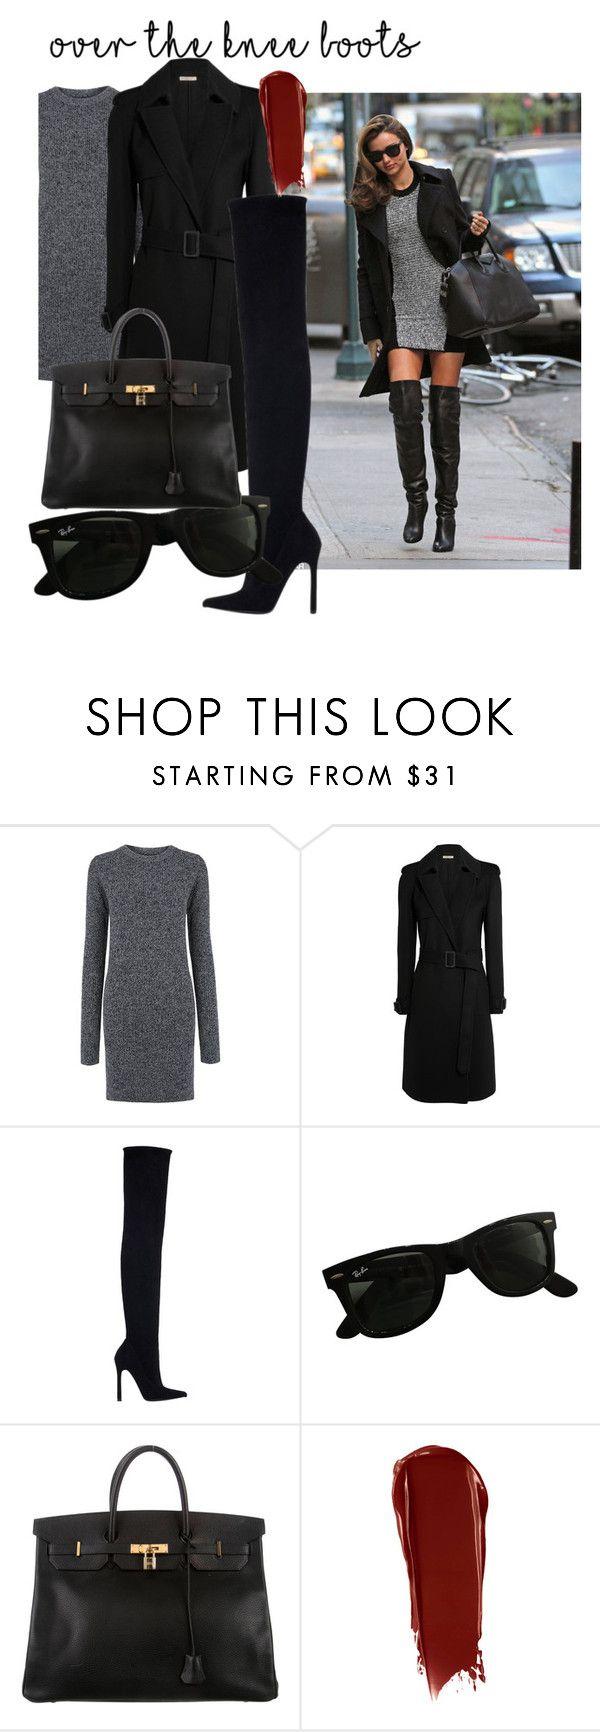 """Untitled #147"" by missbonnybee ❤ liked on Polyvore featuring Kerr®, Current/Elliott, Bottega Veneta, Zara, Ray-Ban, Hermès and NARS Cosmetics"